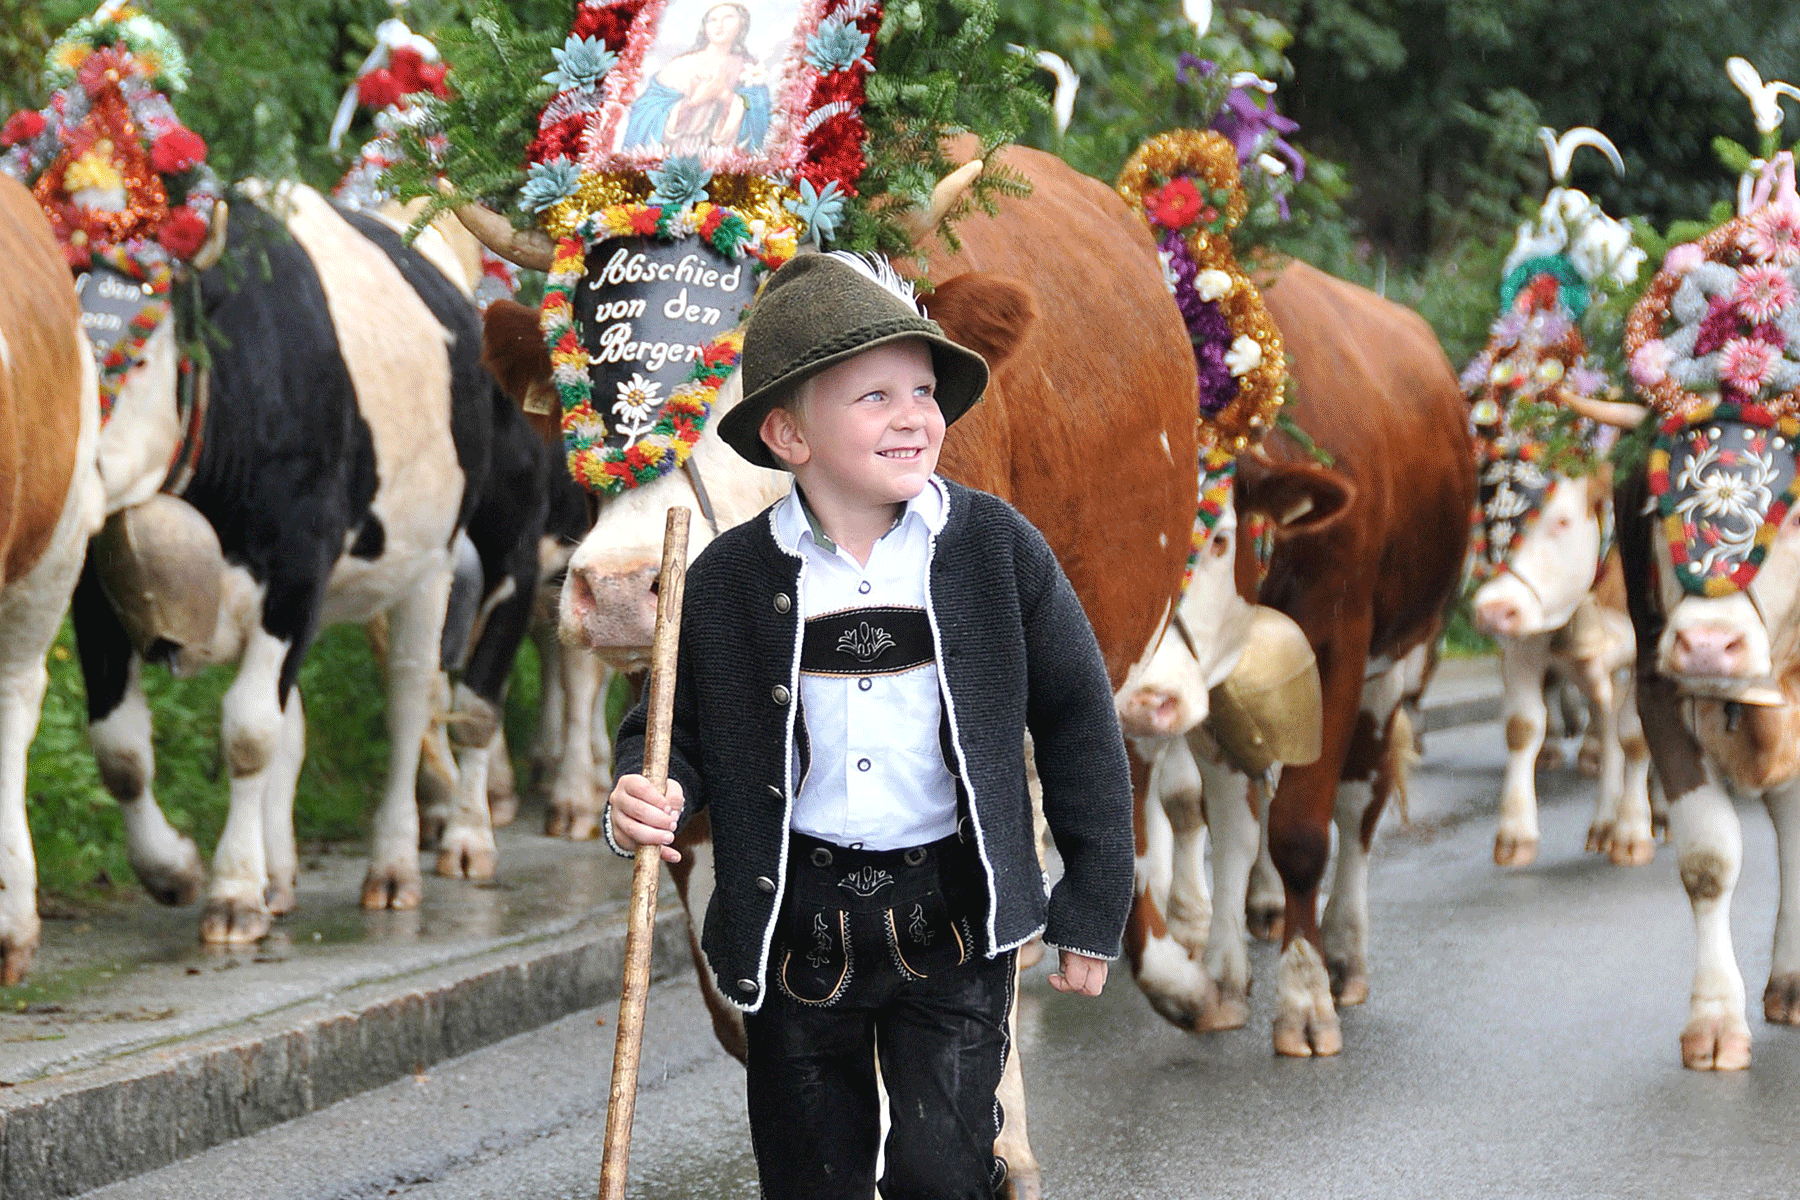 Krichtag Bub Kurzurlaub Tirol